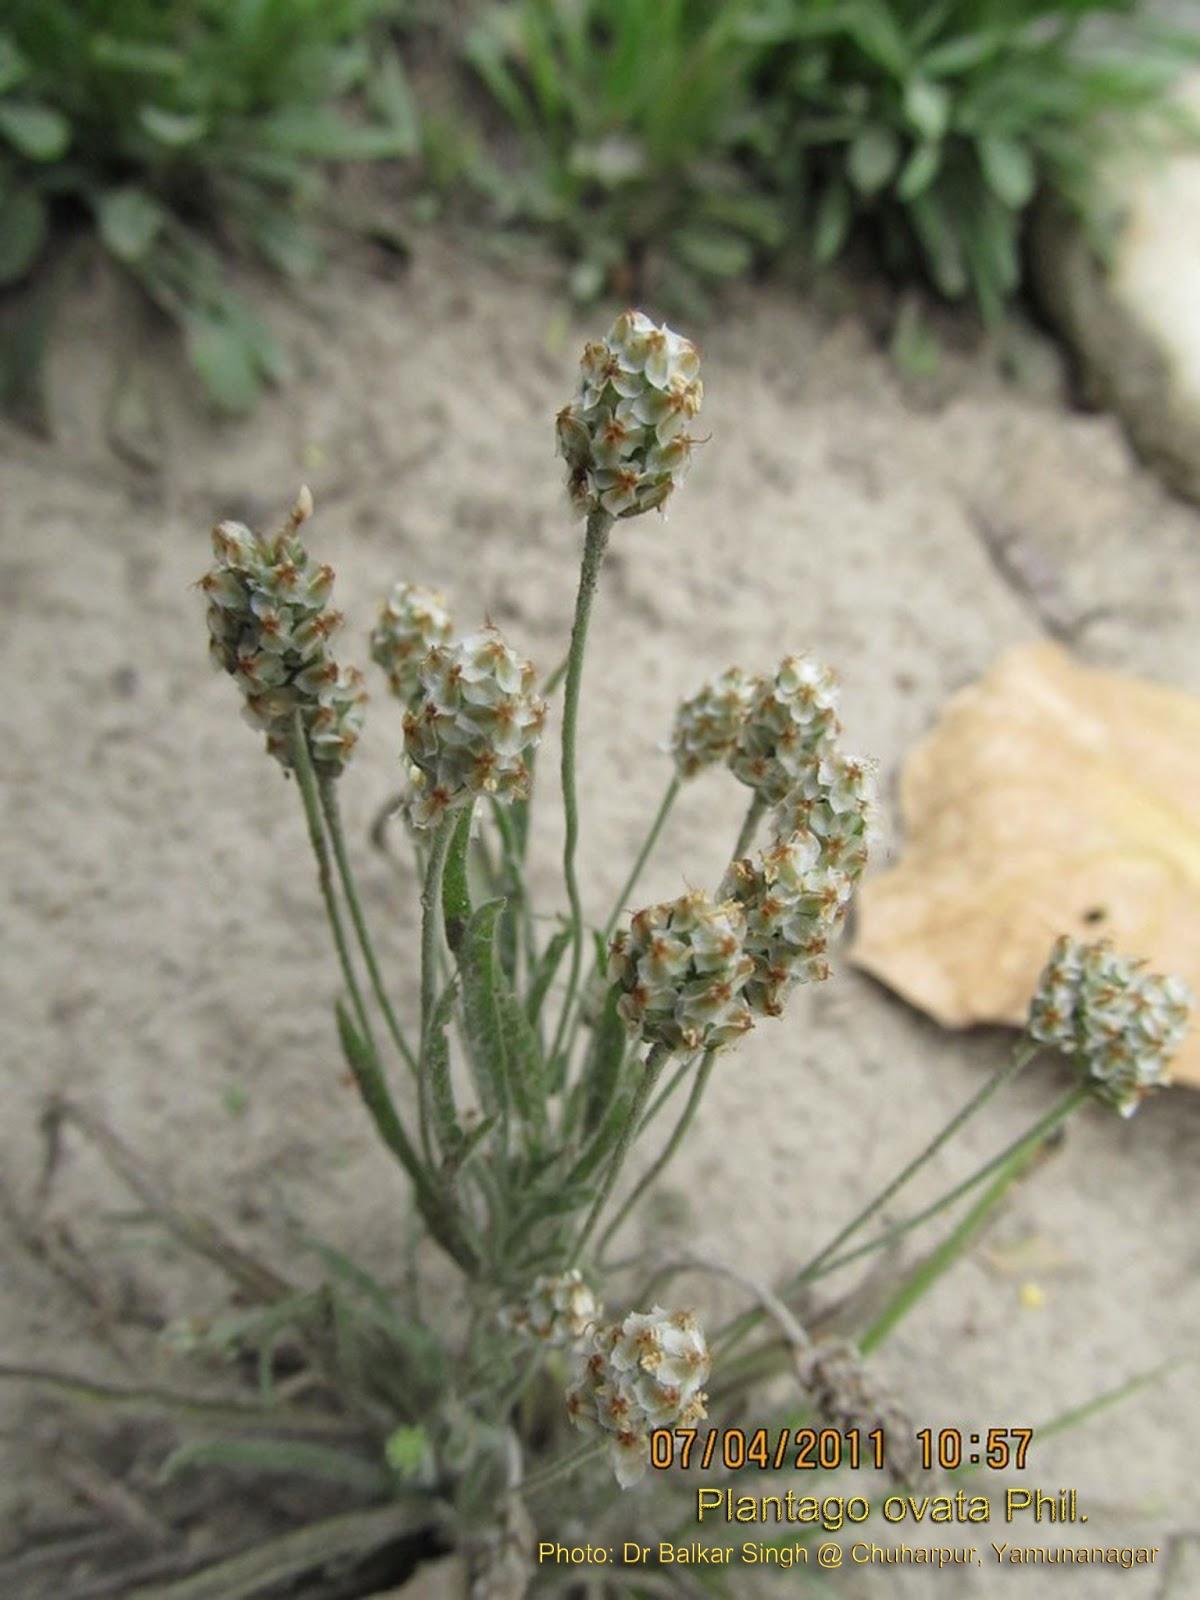 Medicinal plants wednesday april 3 2013 ccuart Choice Image